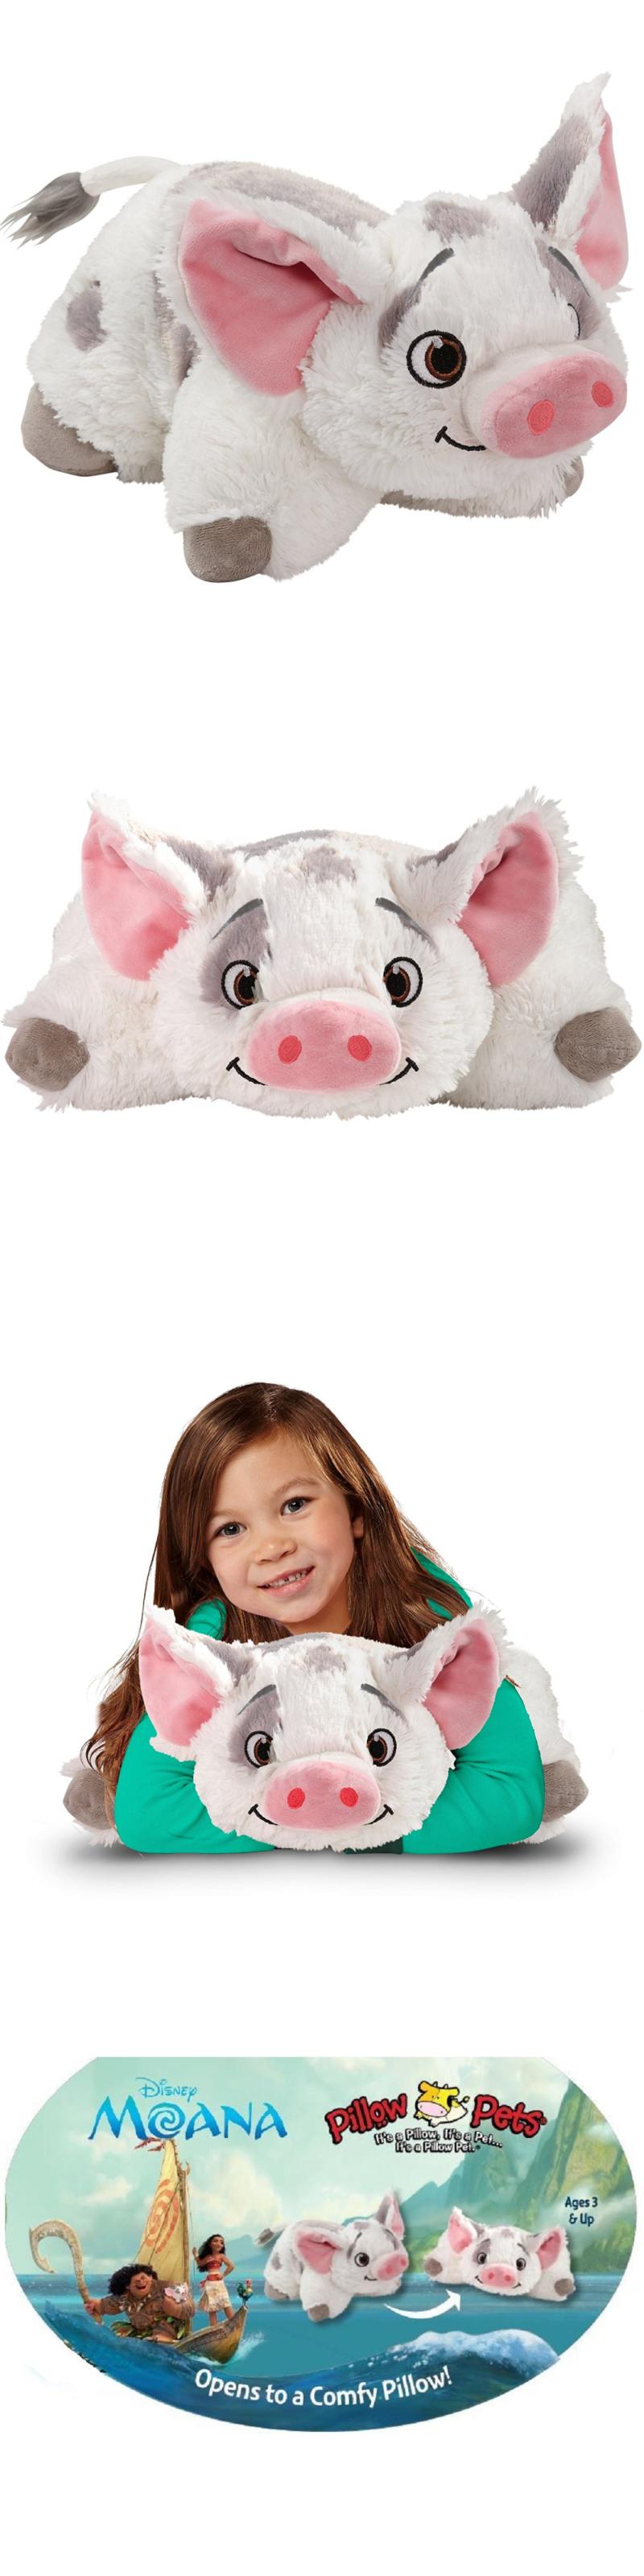 Disney 2597 Pillow Pets Disney Moana Pu A Pu A The Pig